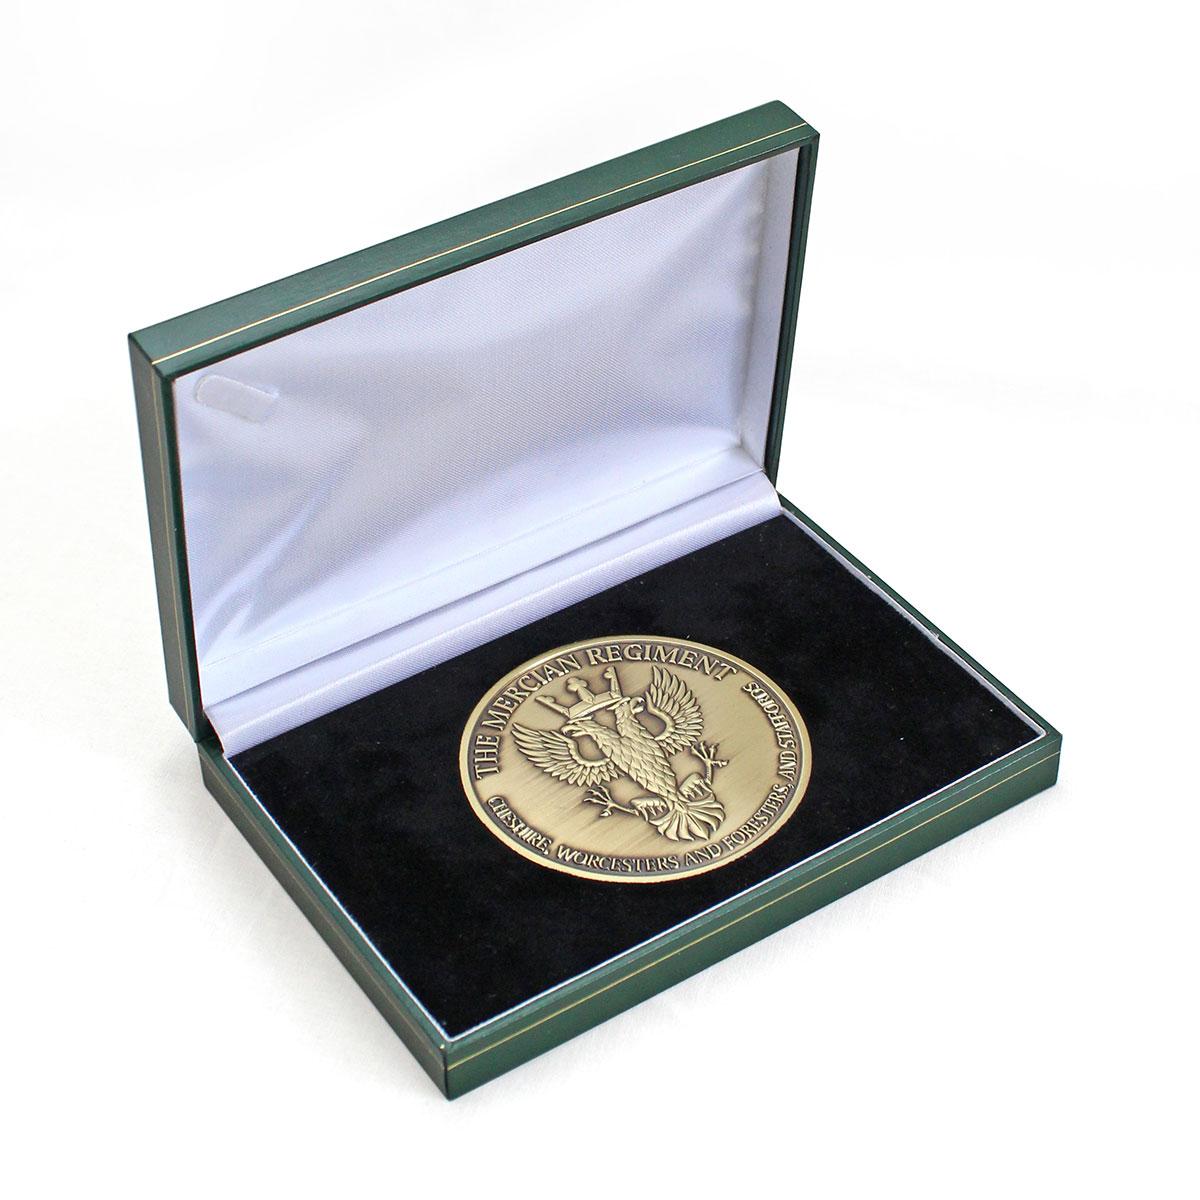 The Mercian Regiment 75mm Gold Antique Regimental Medal Award Reverse